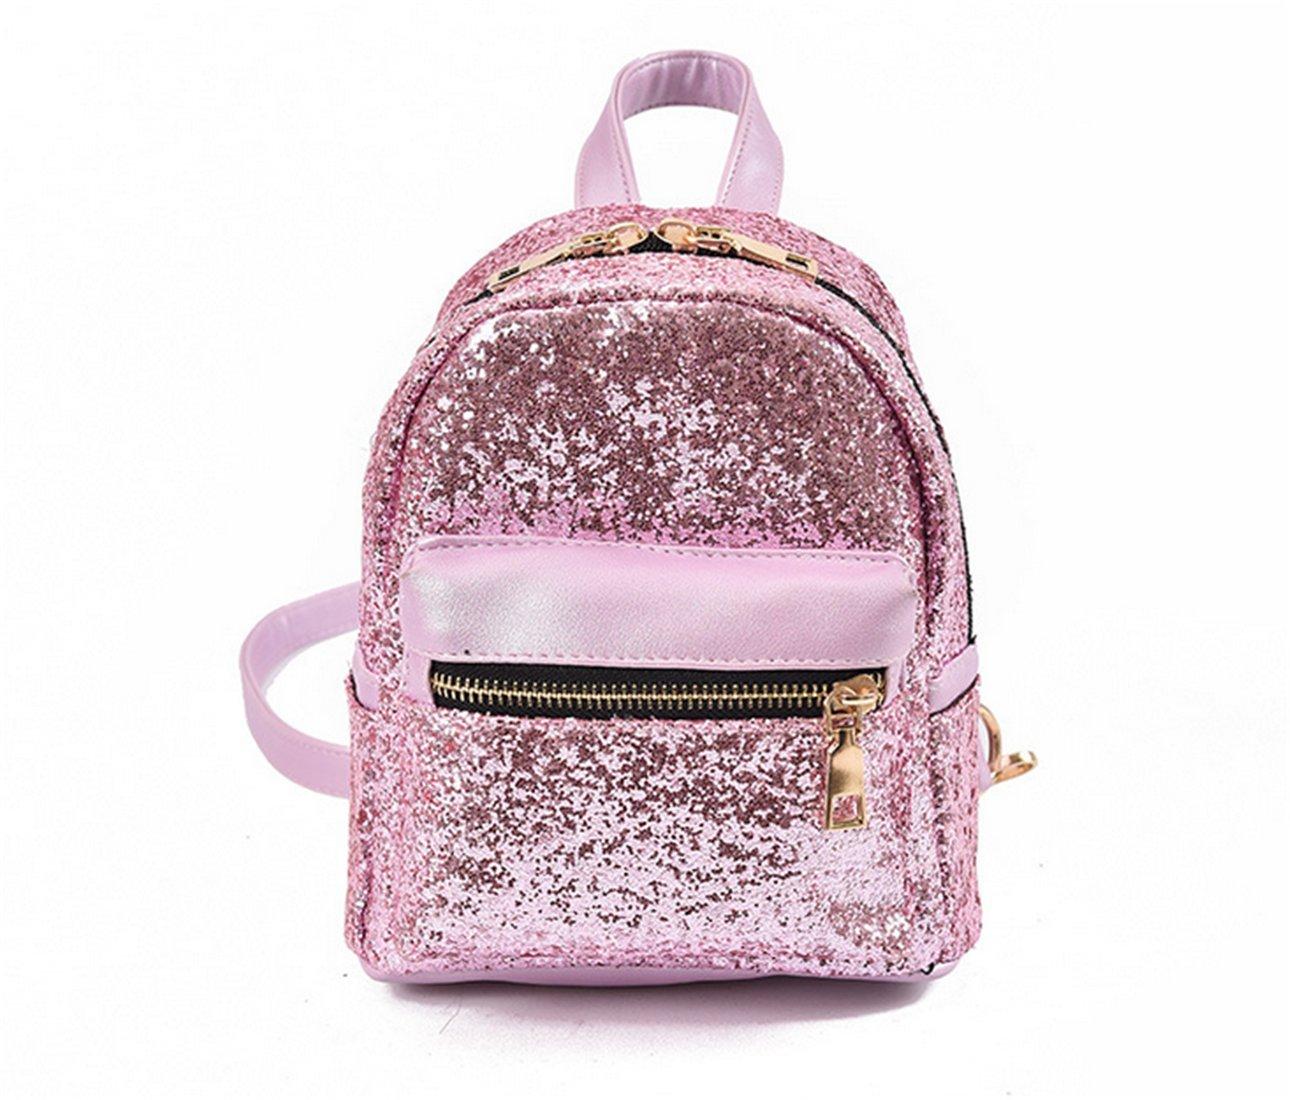 Nodykka Backpack Purse Shoulder Travel Bag Mini Sequin Crossbody Fashion Handbags For Women Girls